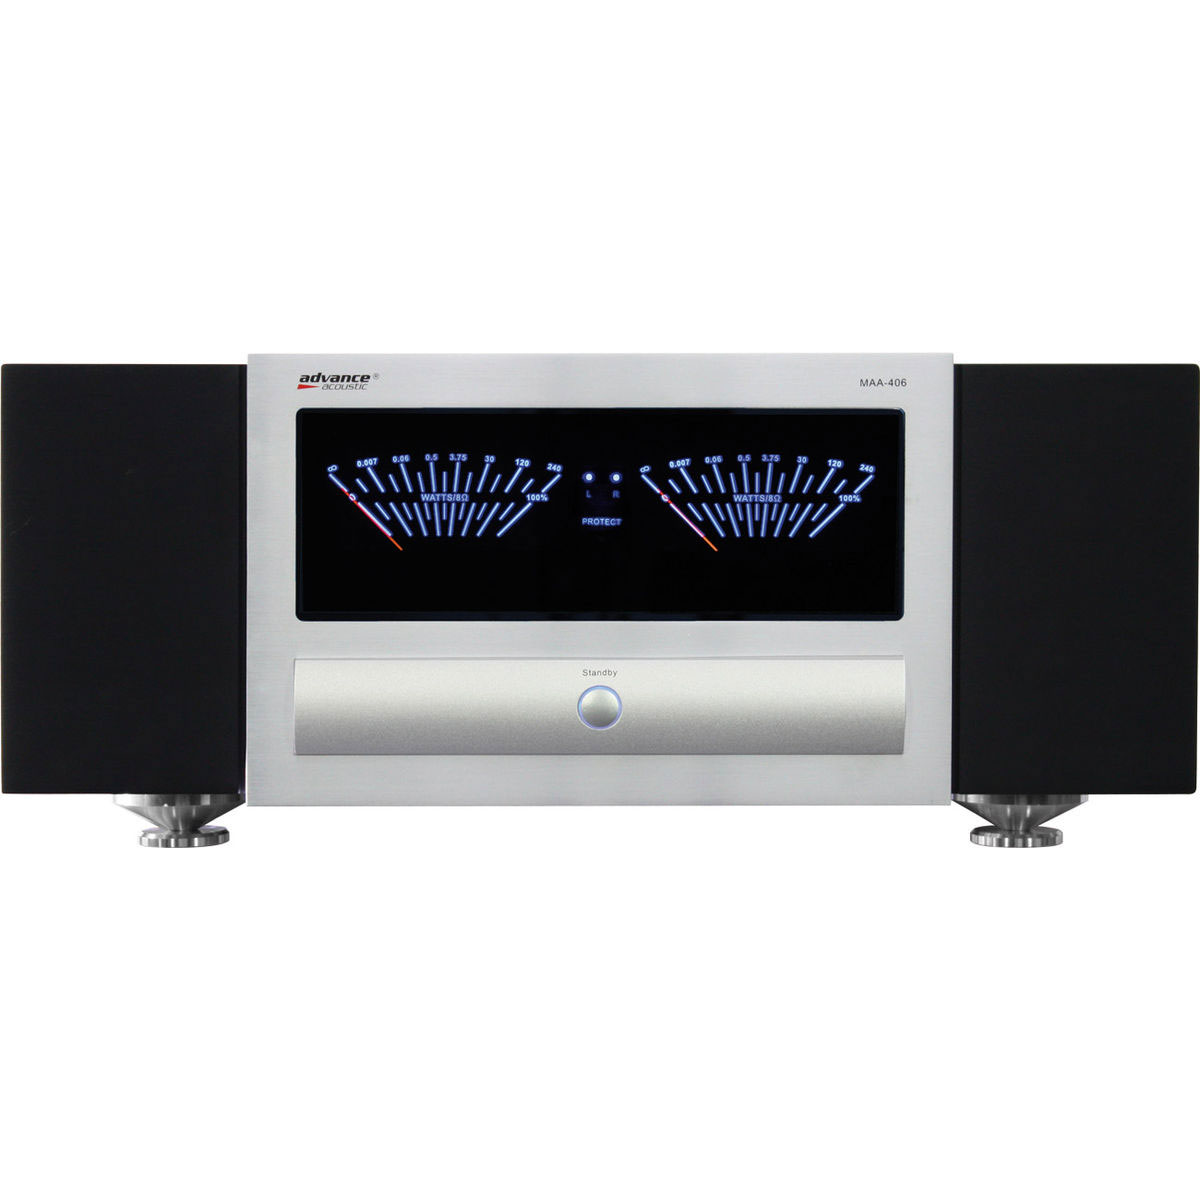 advance acoustic maa 406 amplificateur hifi advance. Black Bedroom Furniture Sets. Home Design Ideas